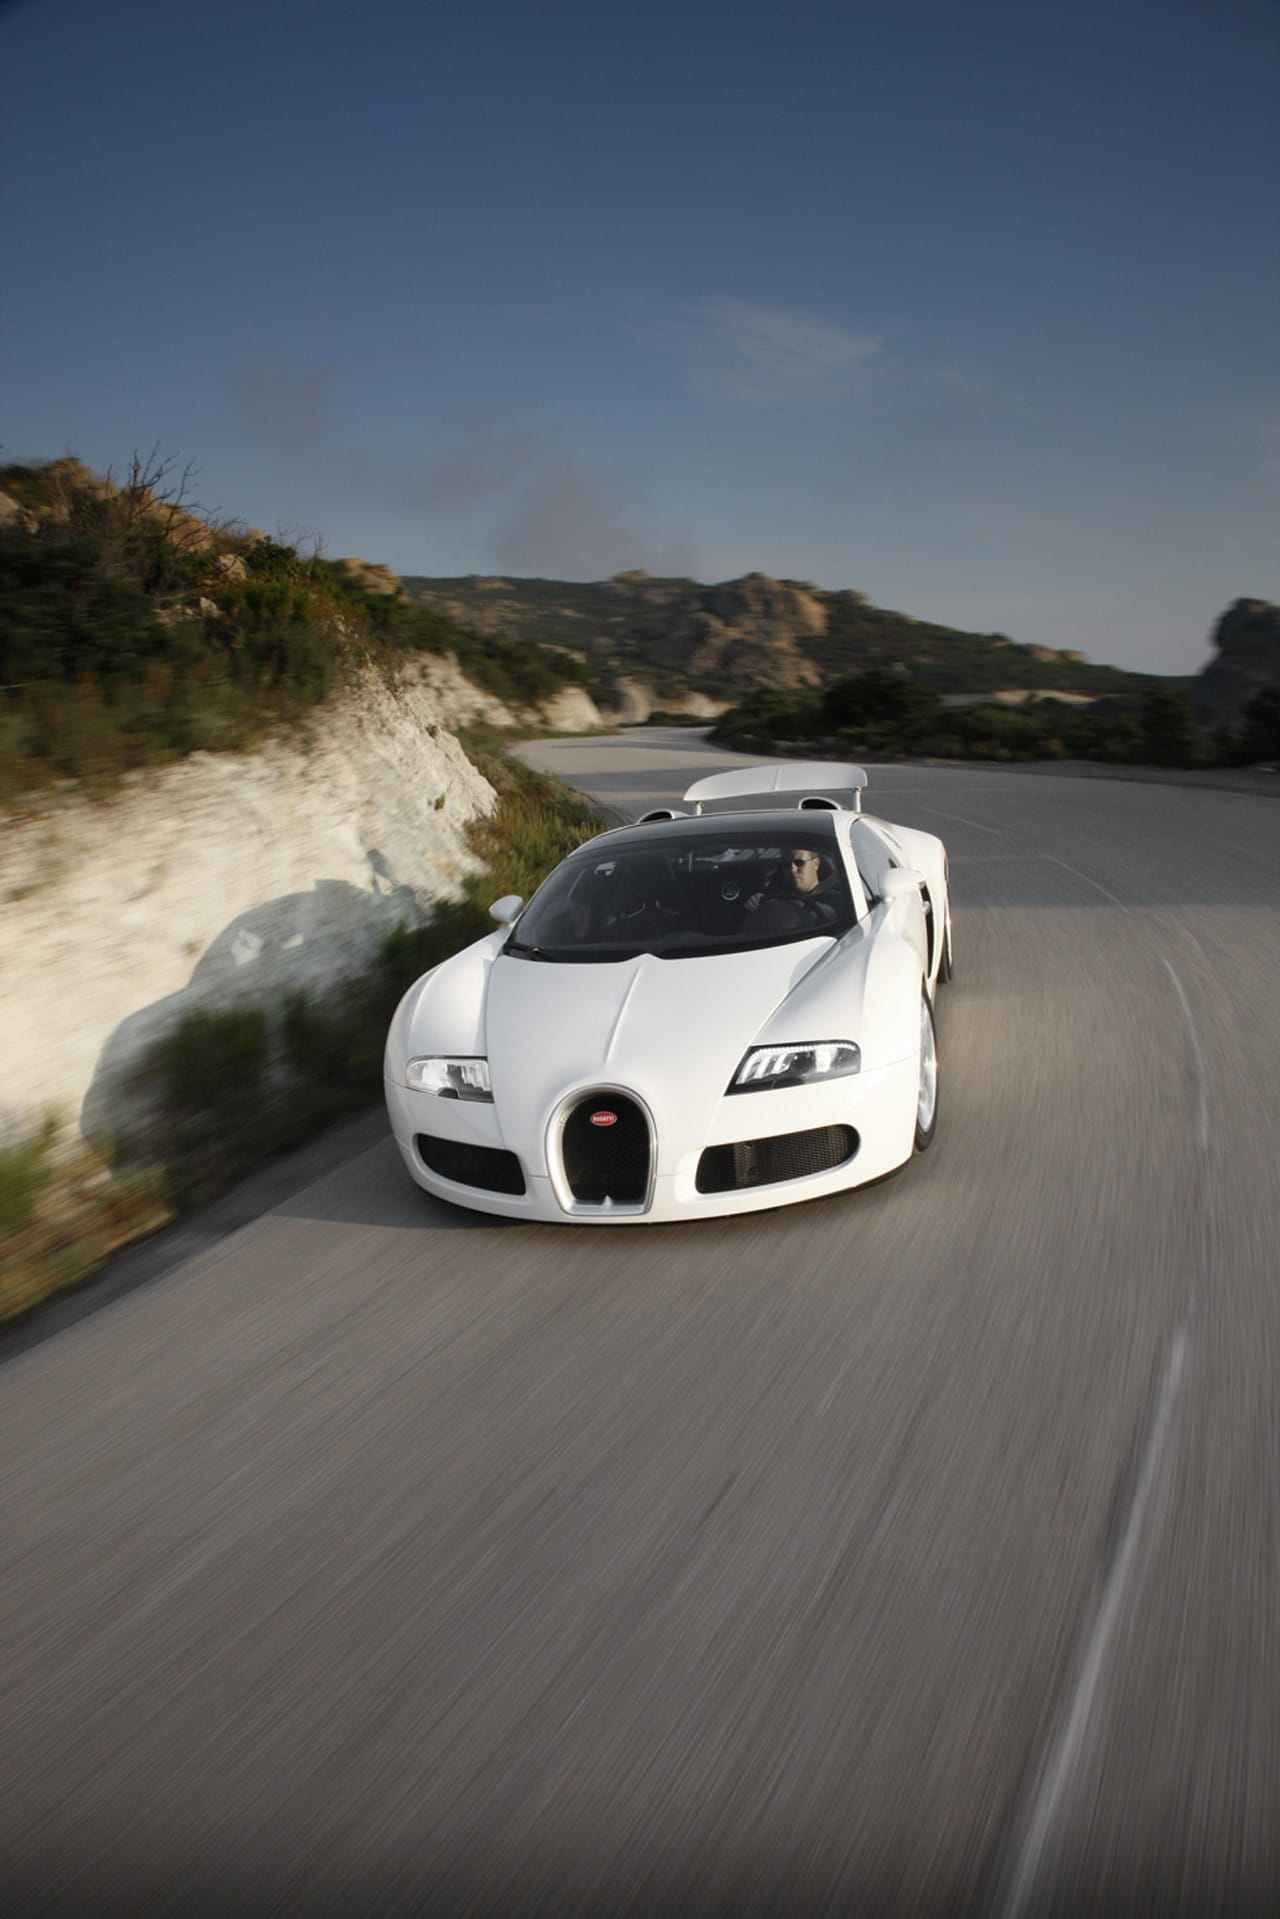 bugatti_veyron_grand_sport_20 Remarkable Bugatti Veyron Grand Sport Vitesse Informacion Cars Trend